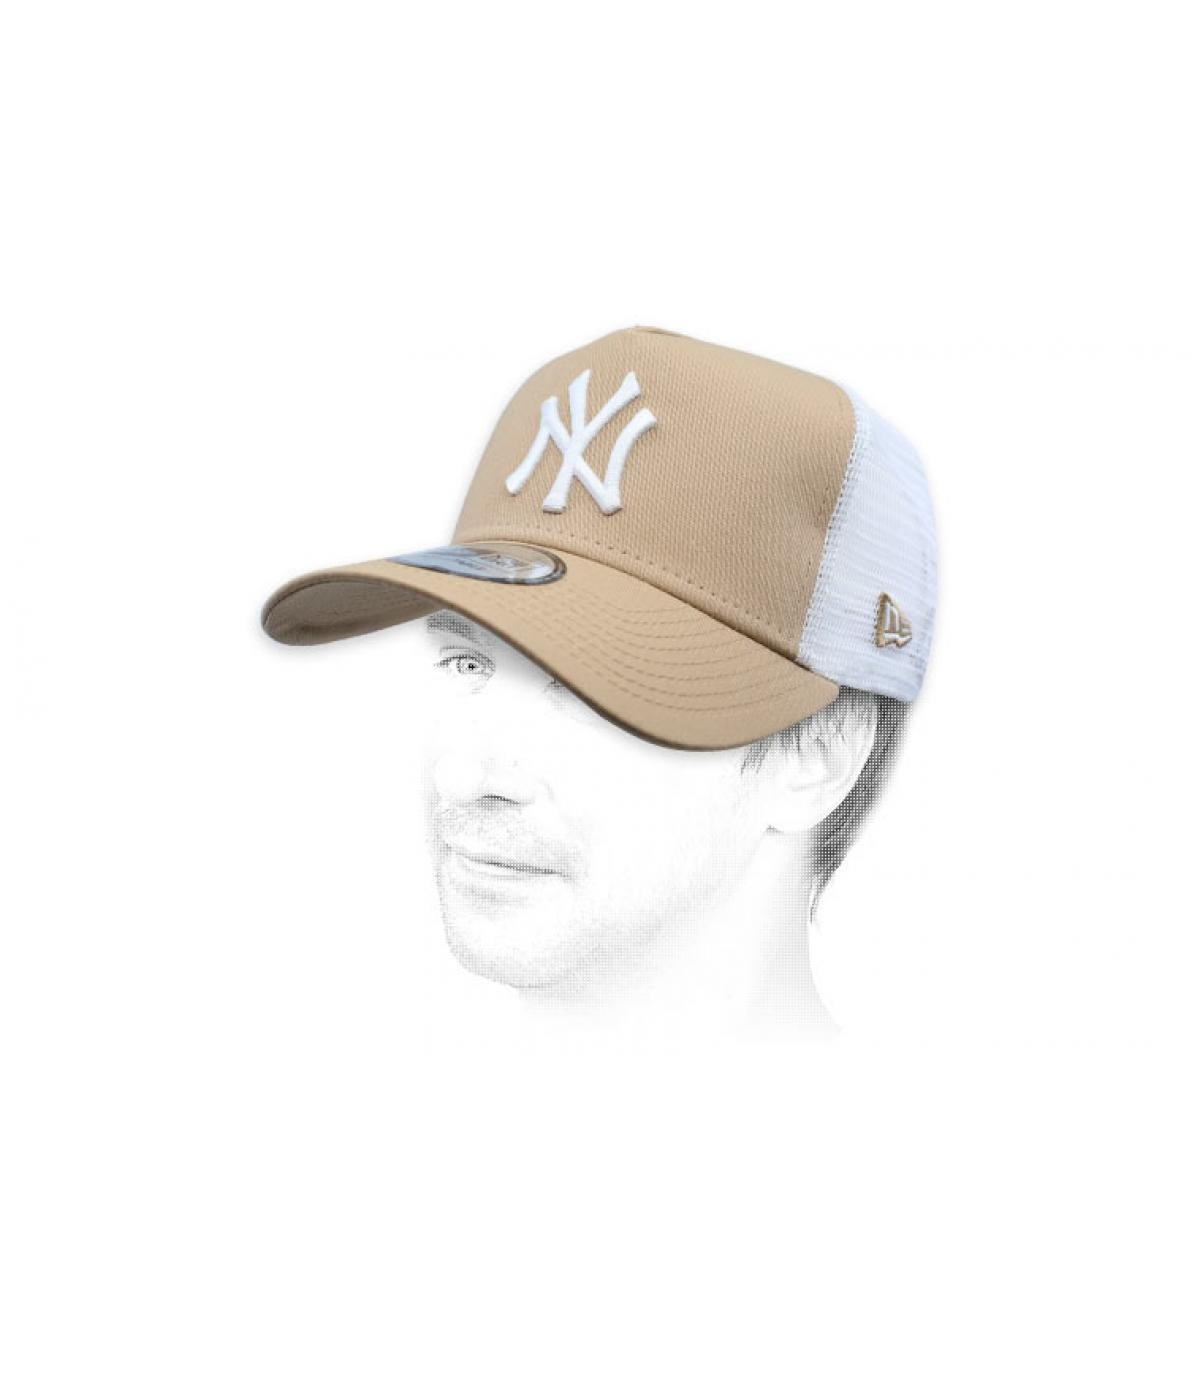 NY beige white trucker